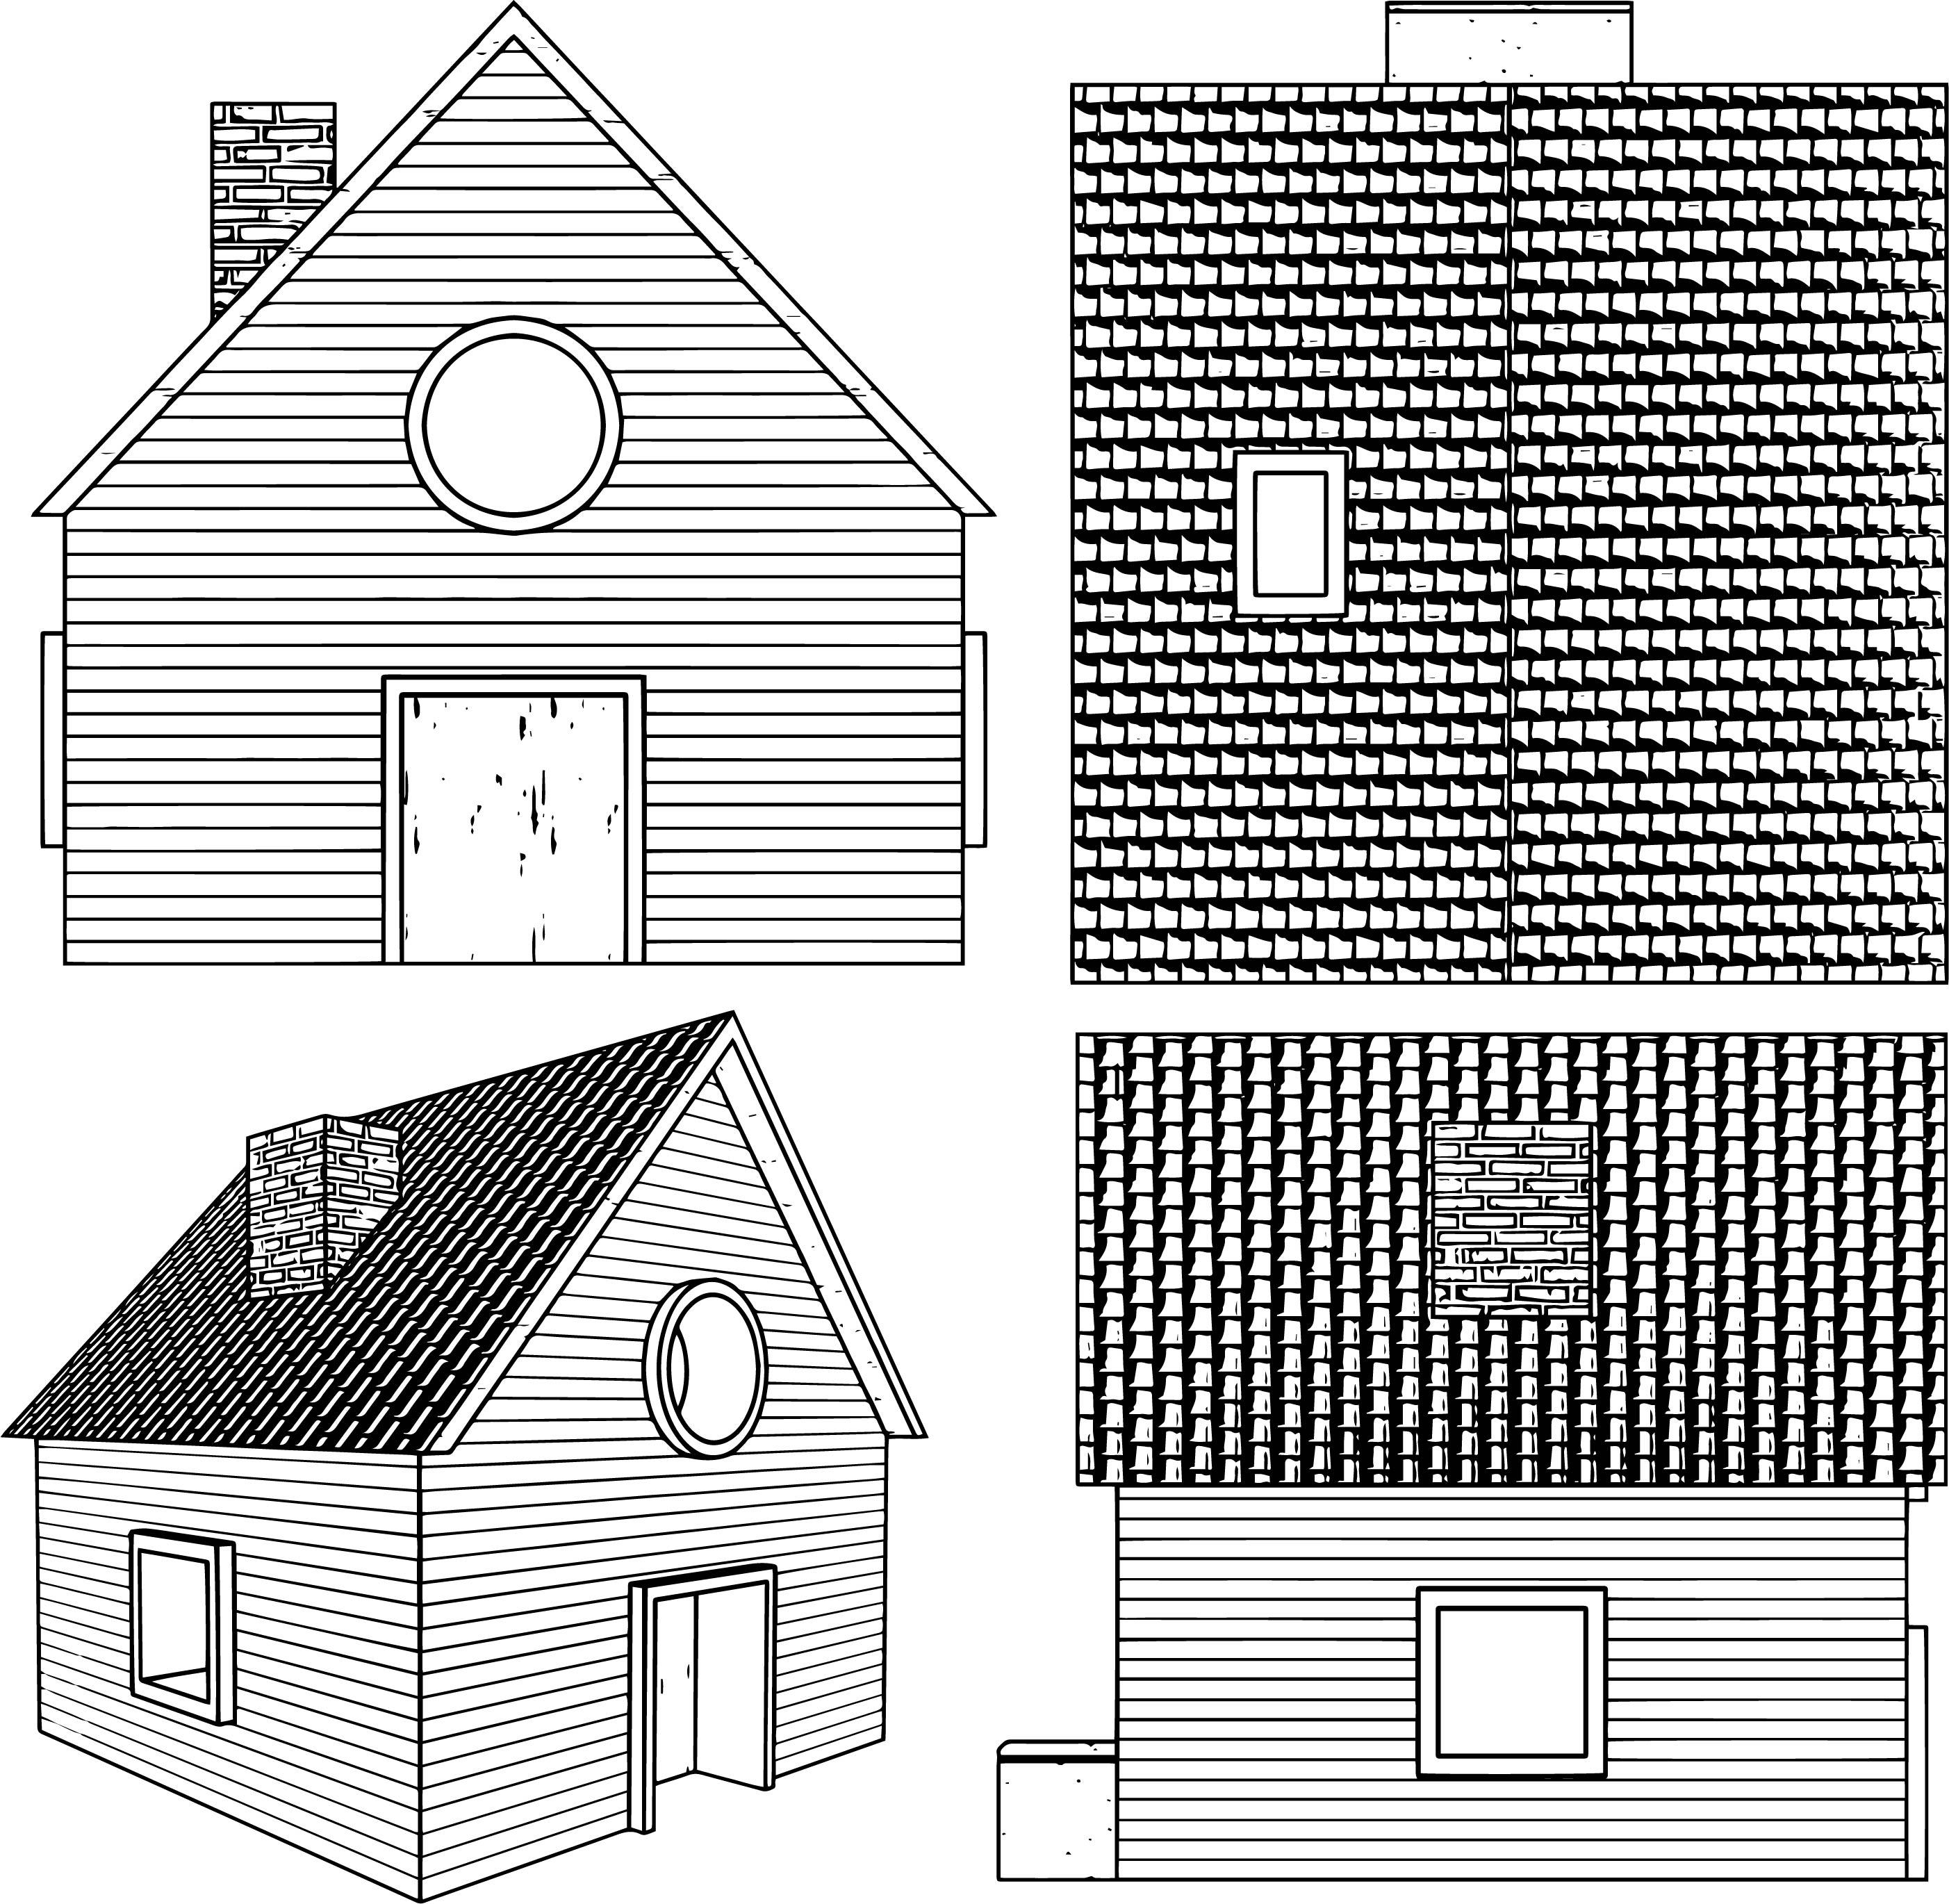 cartoon house casa coloring page